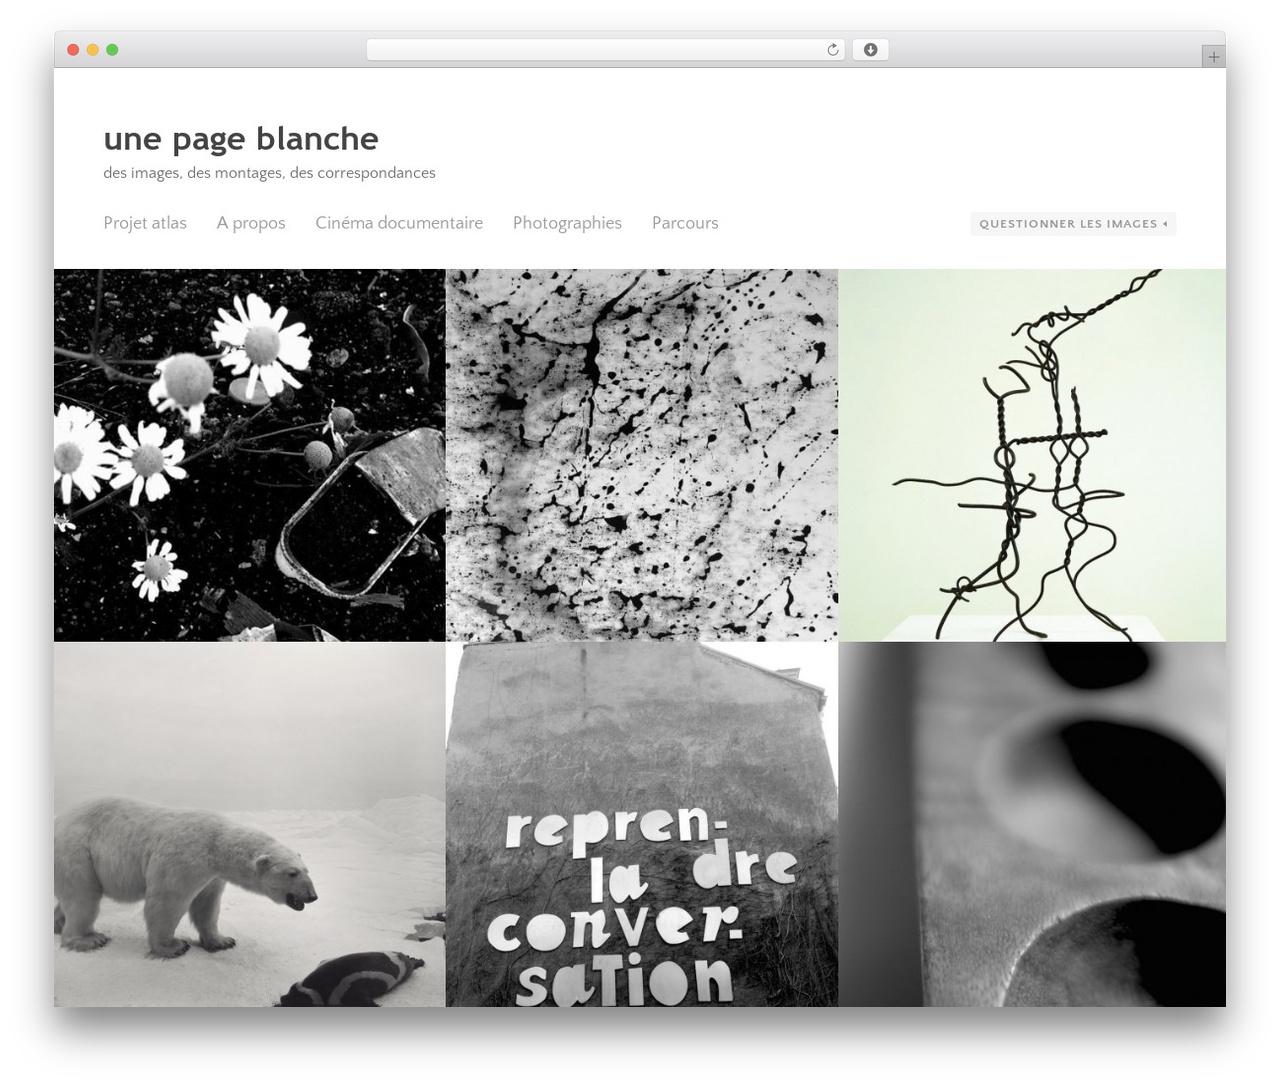 Bindery Template Wordpress By Pixel Union Unepageblanchecom